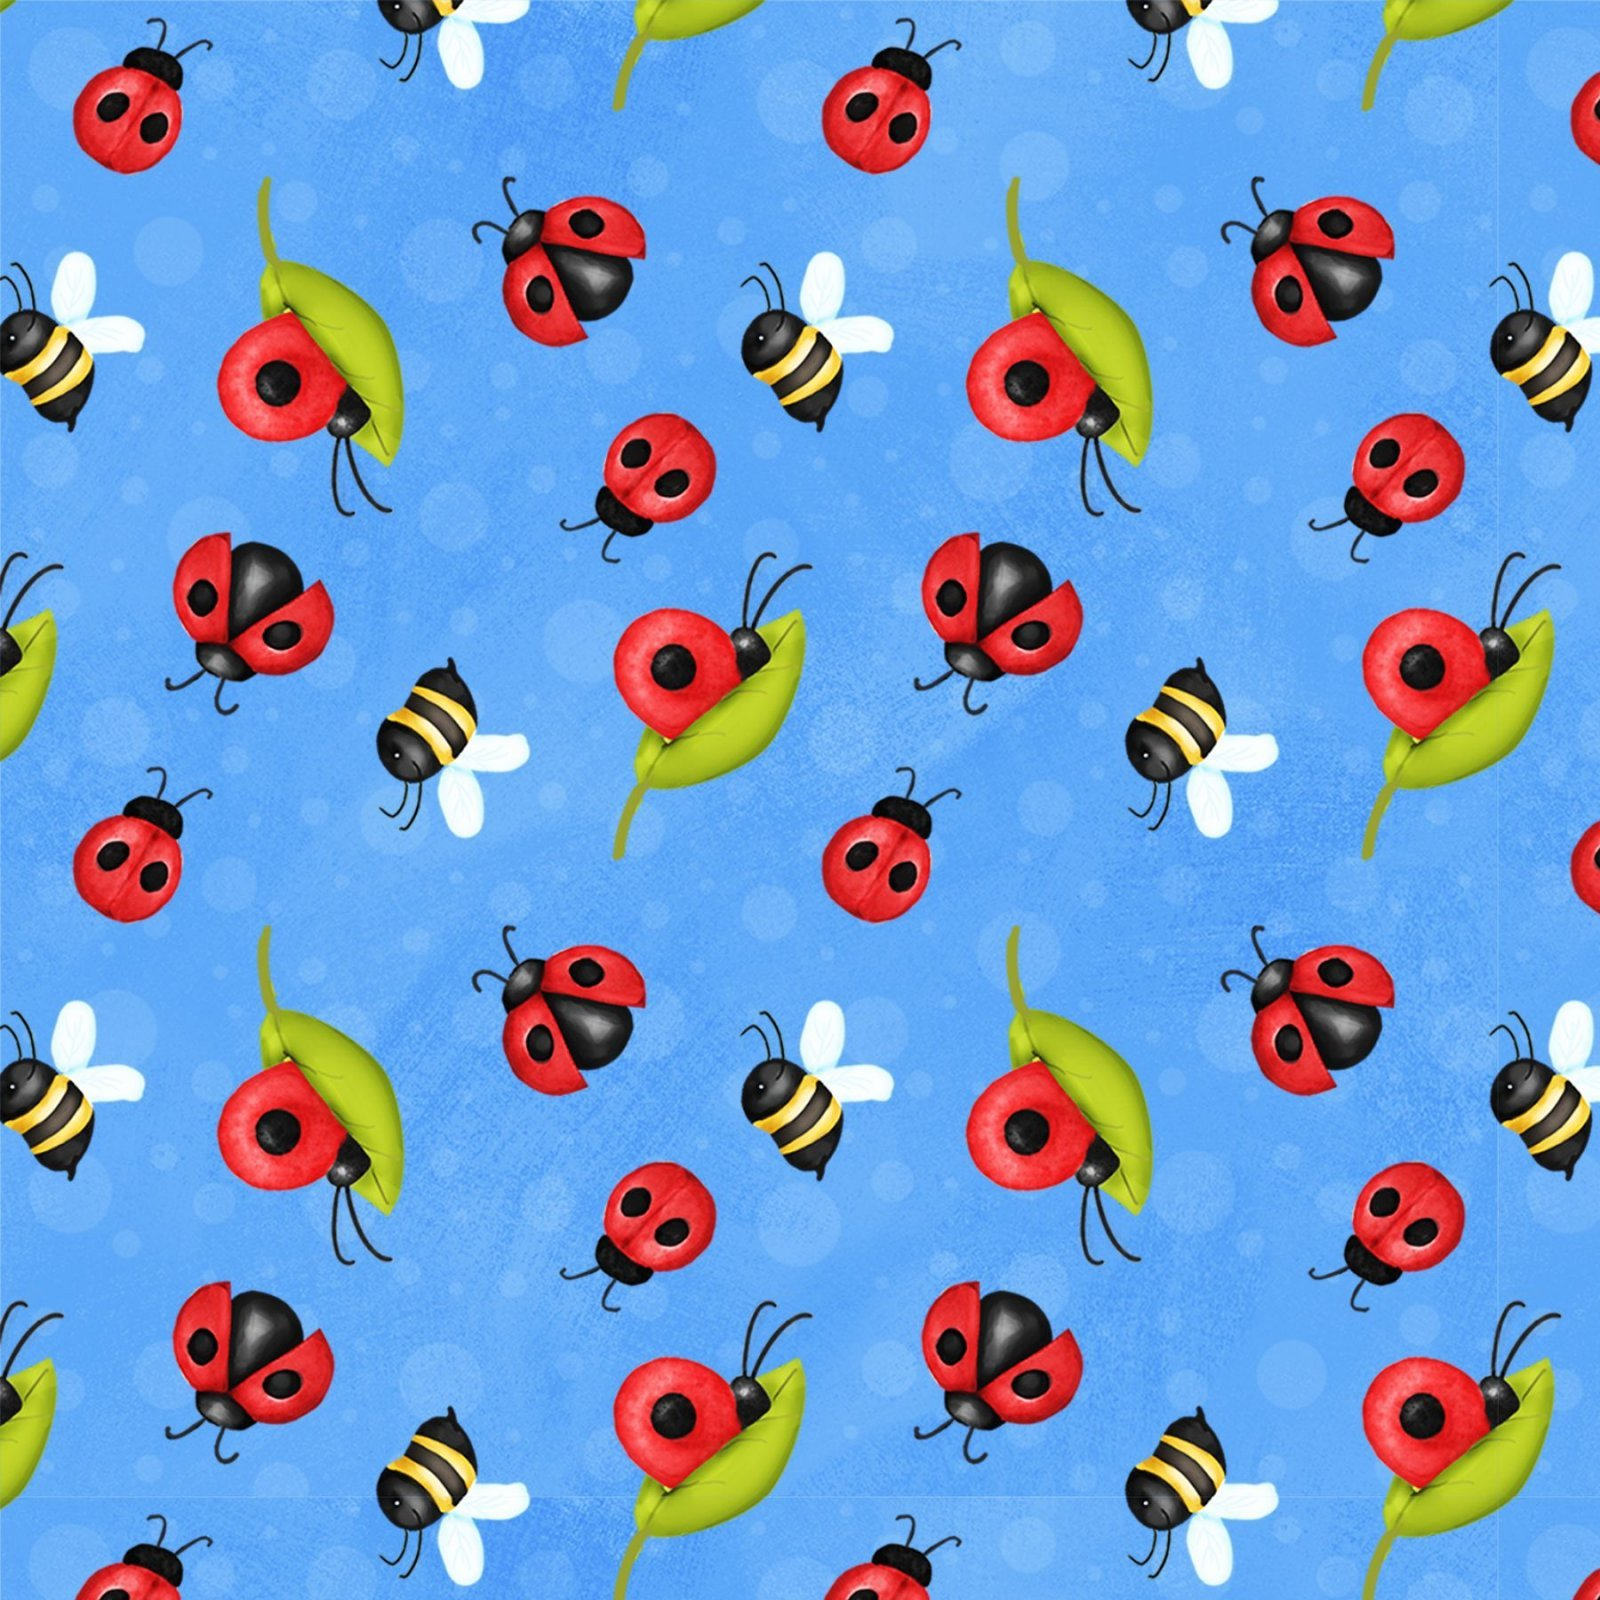 *EOB* Gnome Garden 9445-11 Ladybugs Blue - 0.41 YD